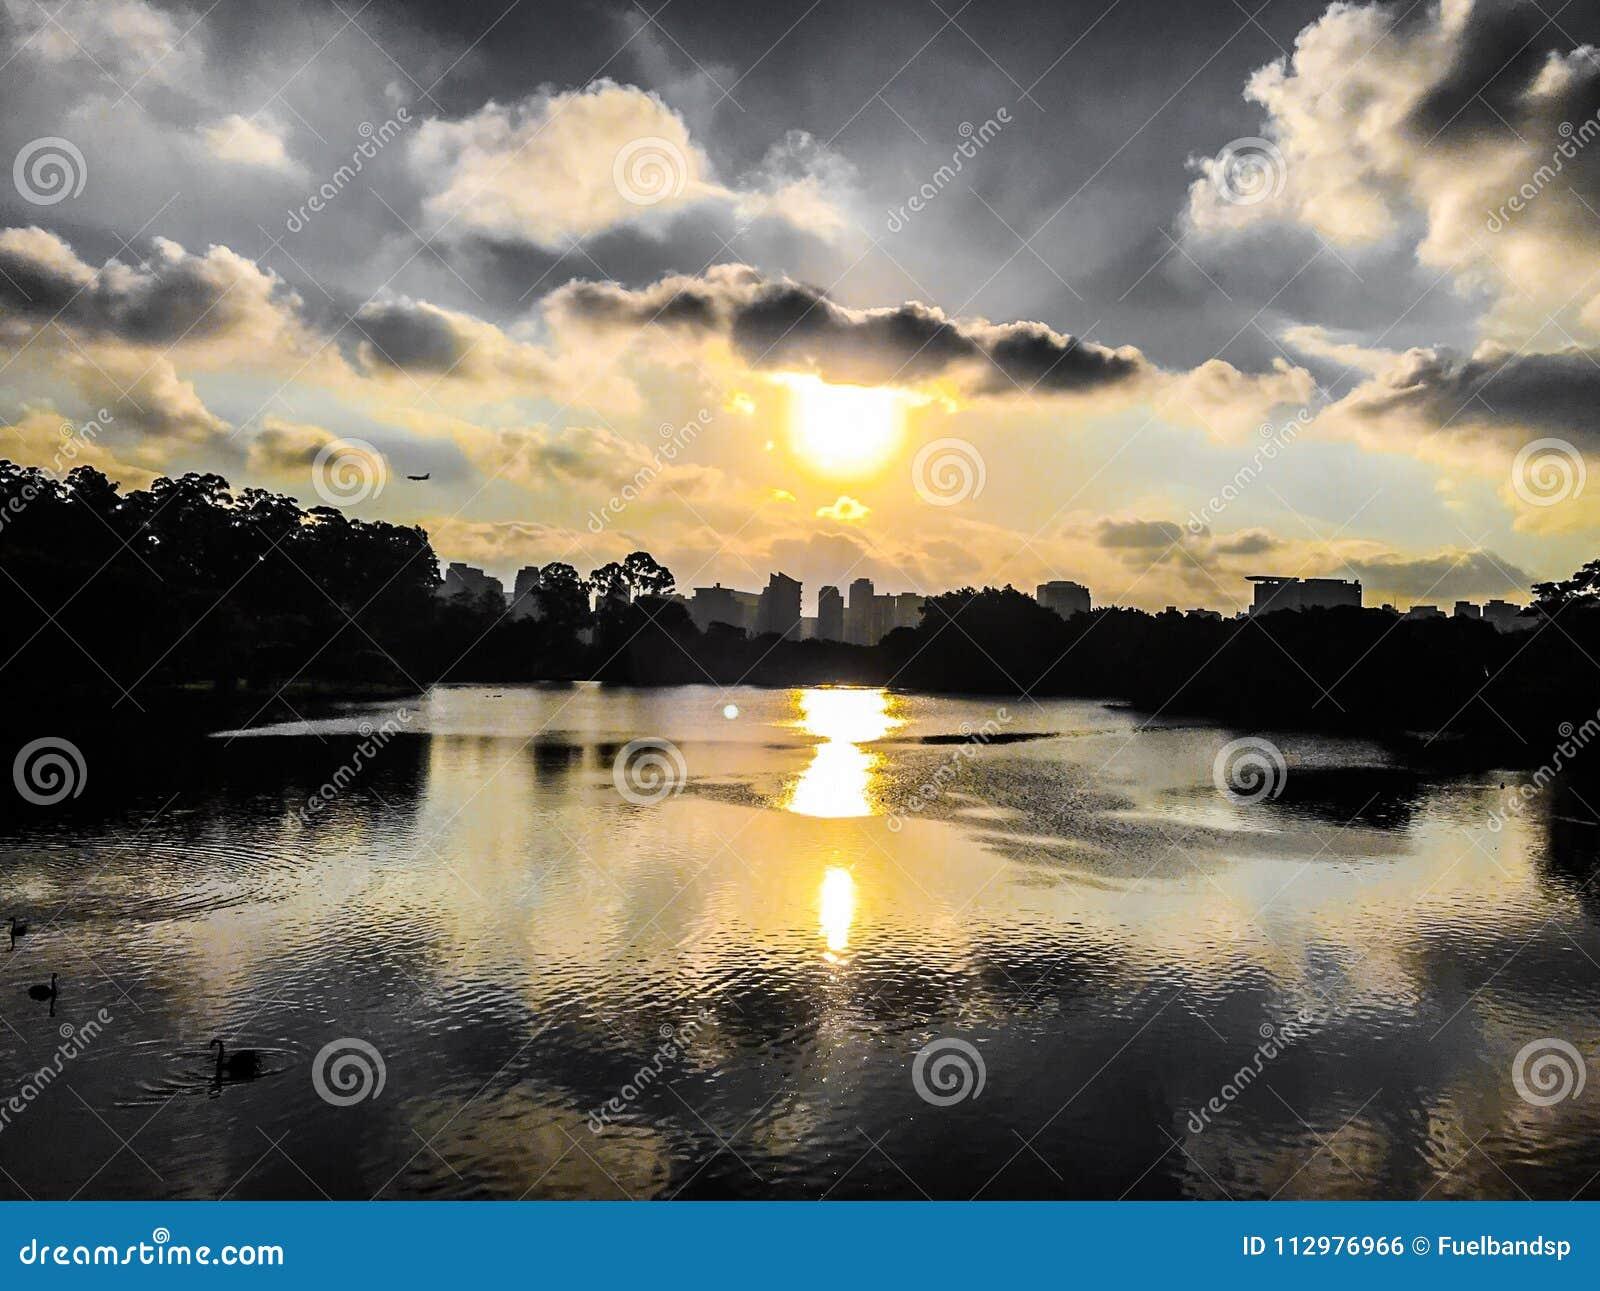 Sunset in the city of São Paulo